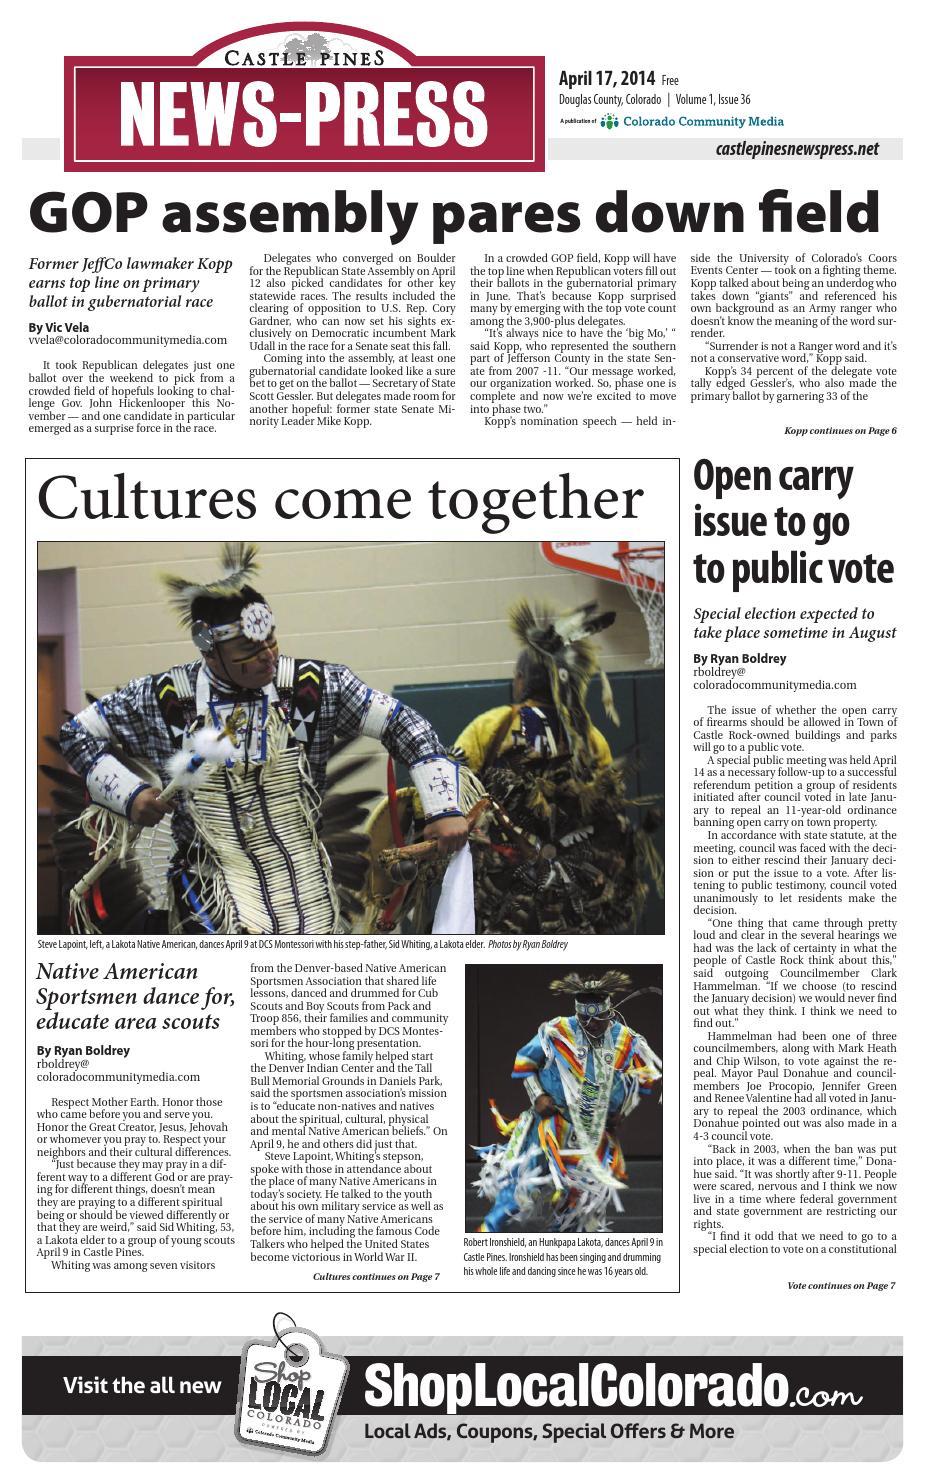 1ad6187191e0a3 Castle pine news press 0417 by Colorado Community Media - issuu